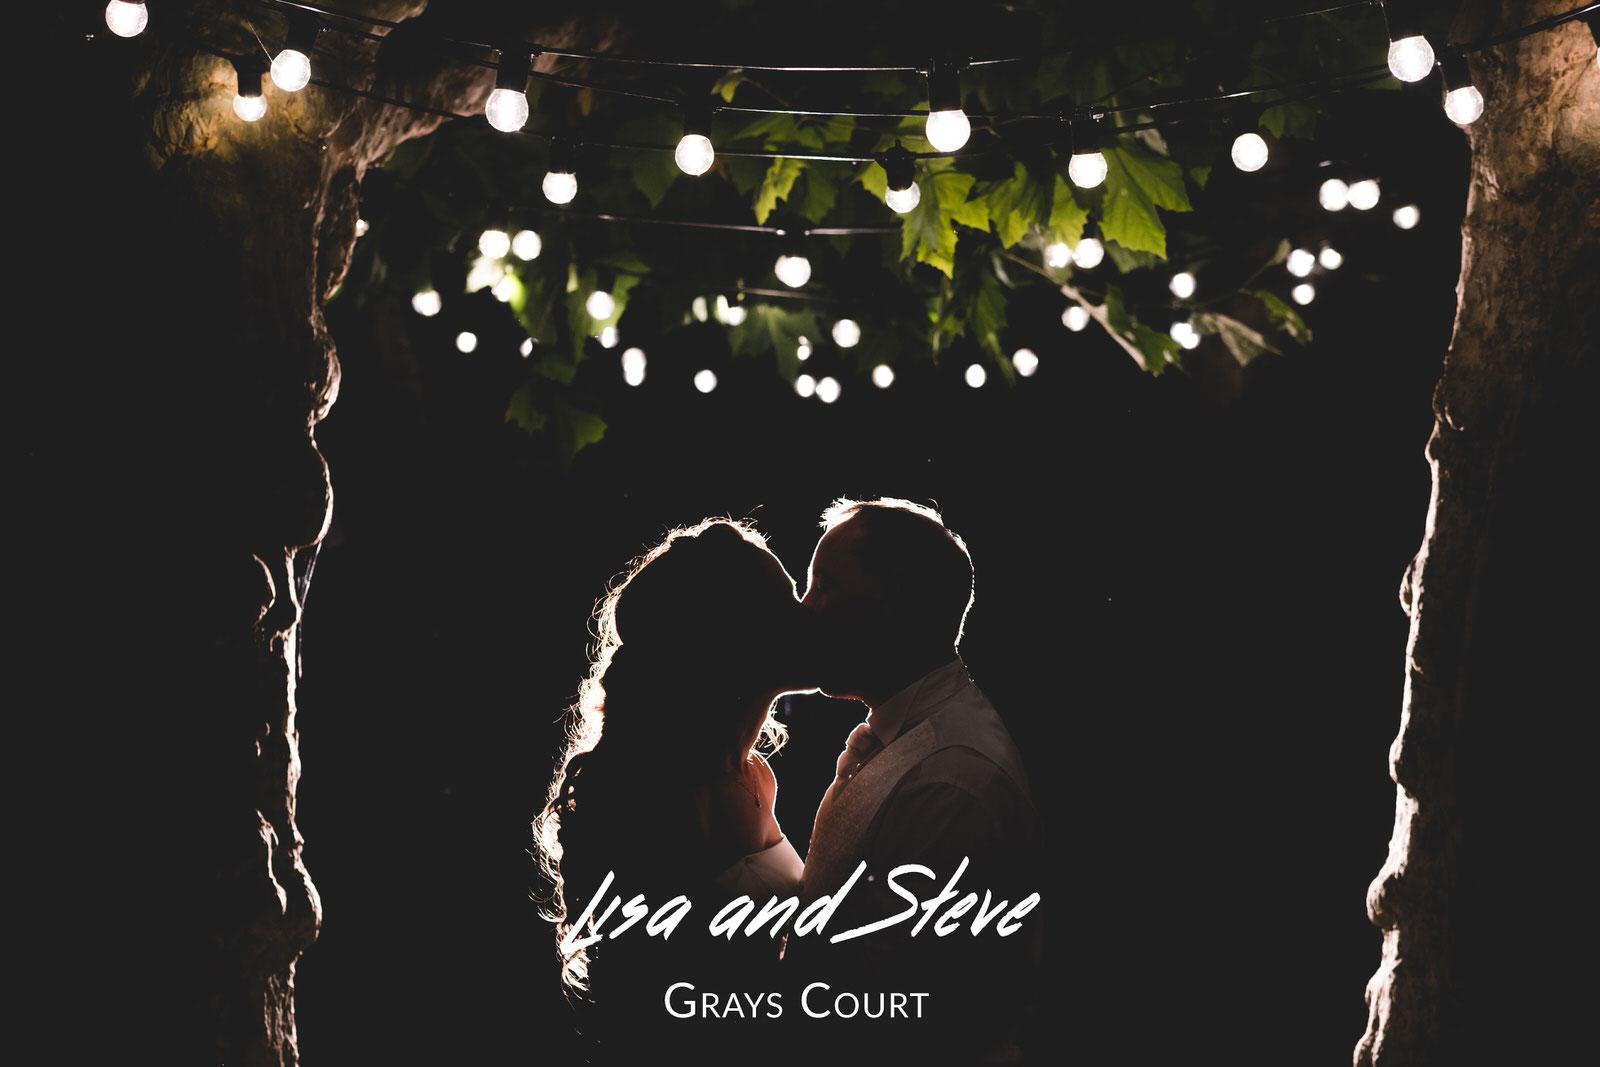 Lisa and Steve's Wedding - Grays Court